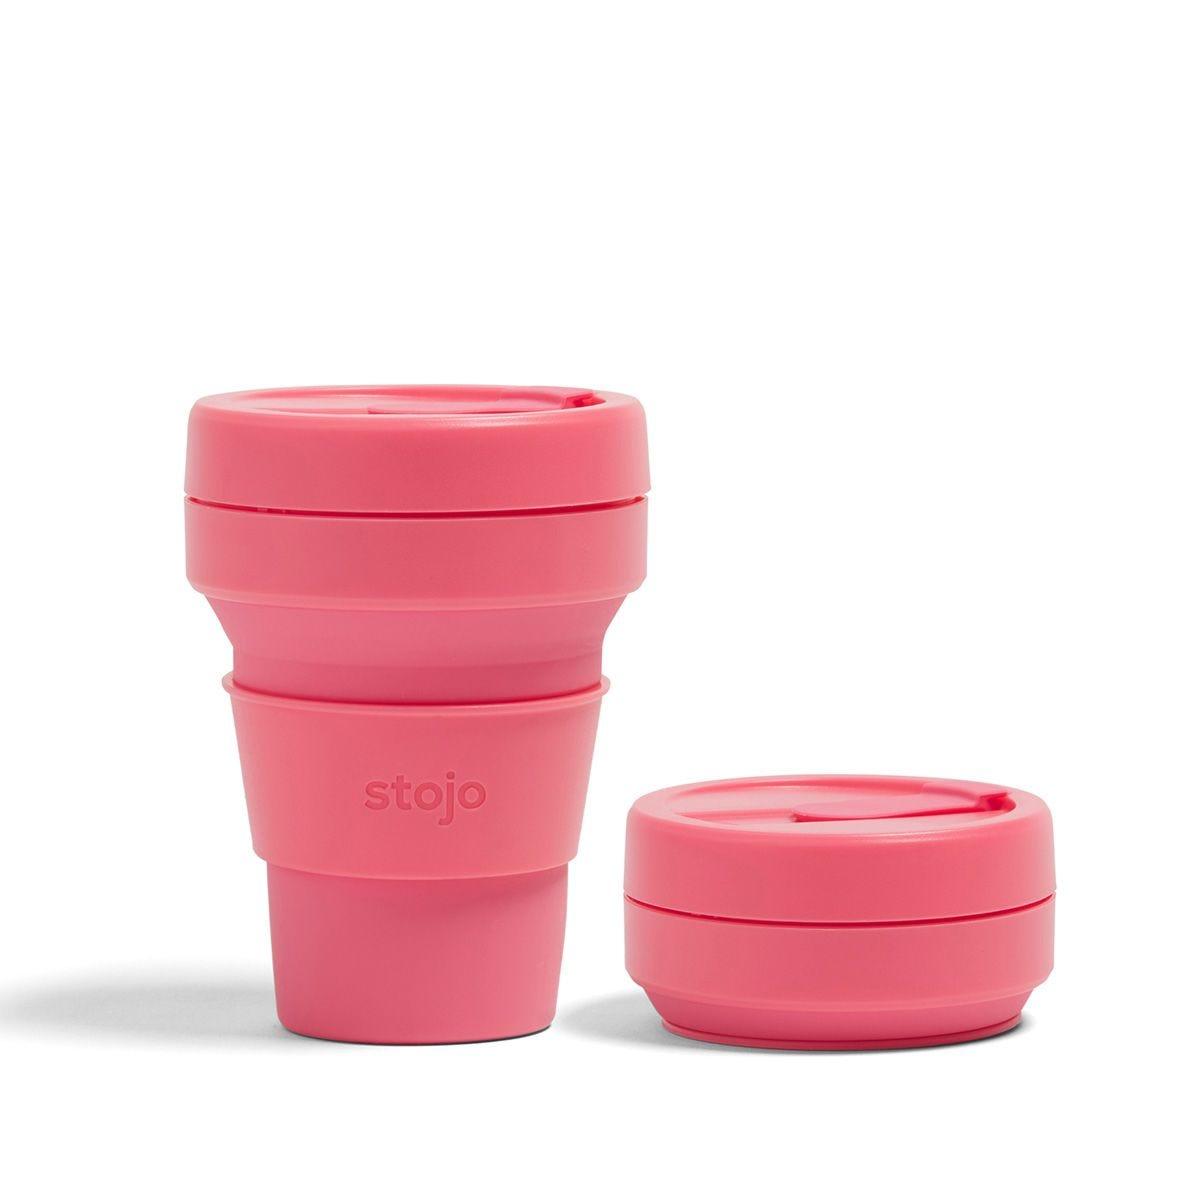 Stojo Collapsible Pocket Cup 12oz - Peony